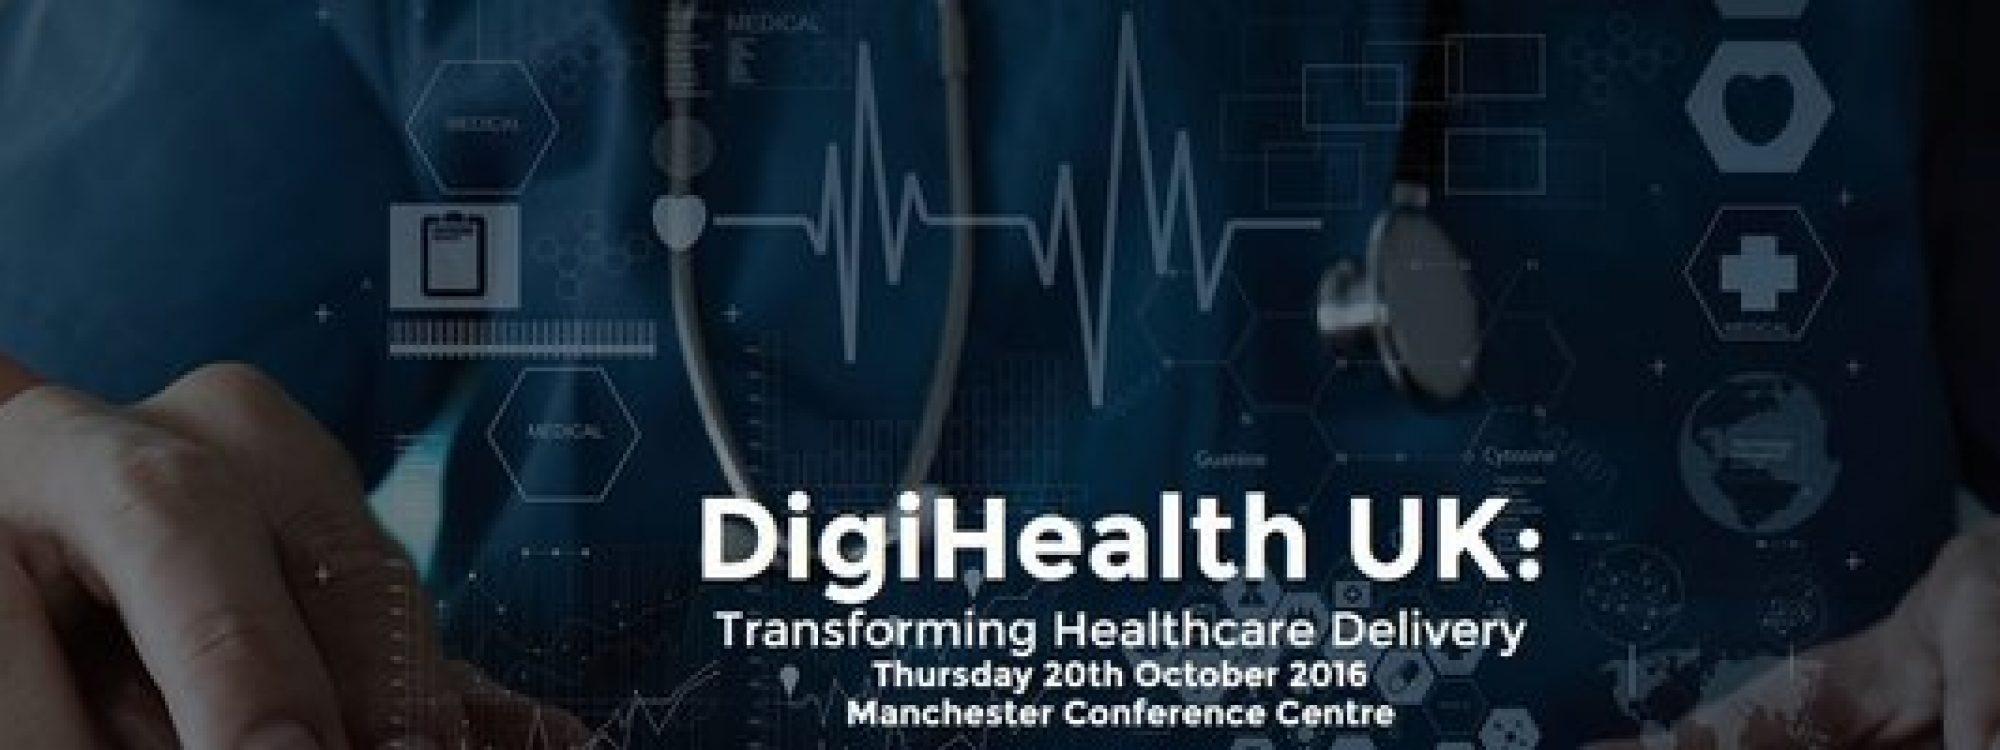 Content Guru to Sponsor DigiHealth UK Conference